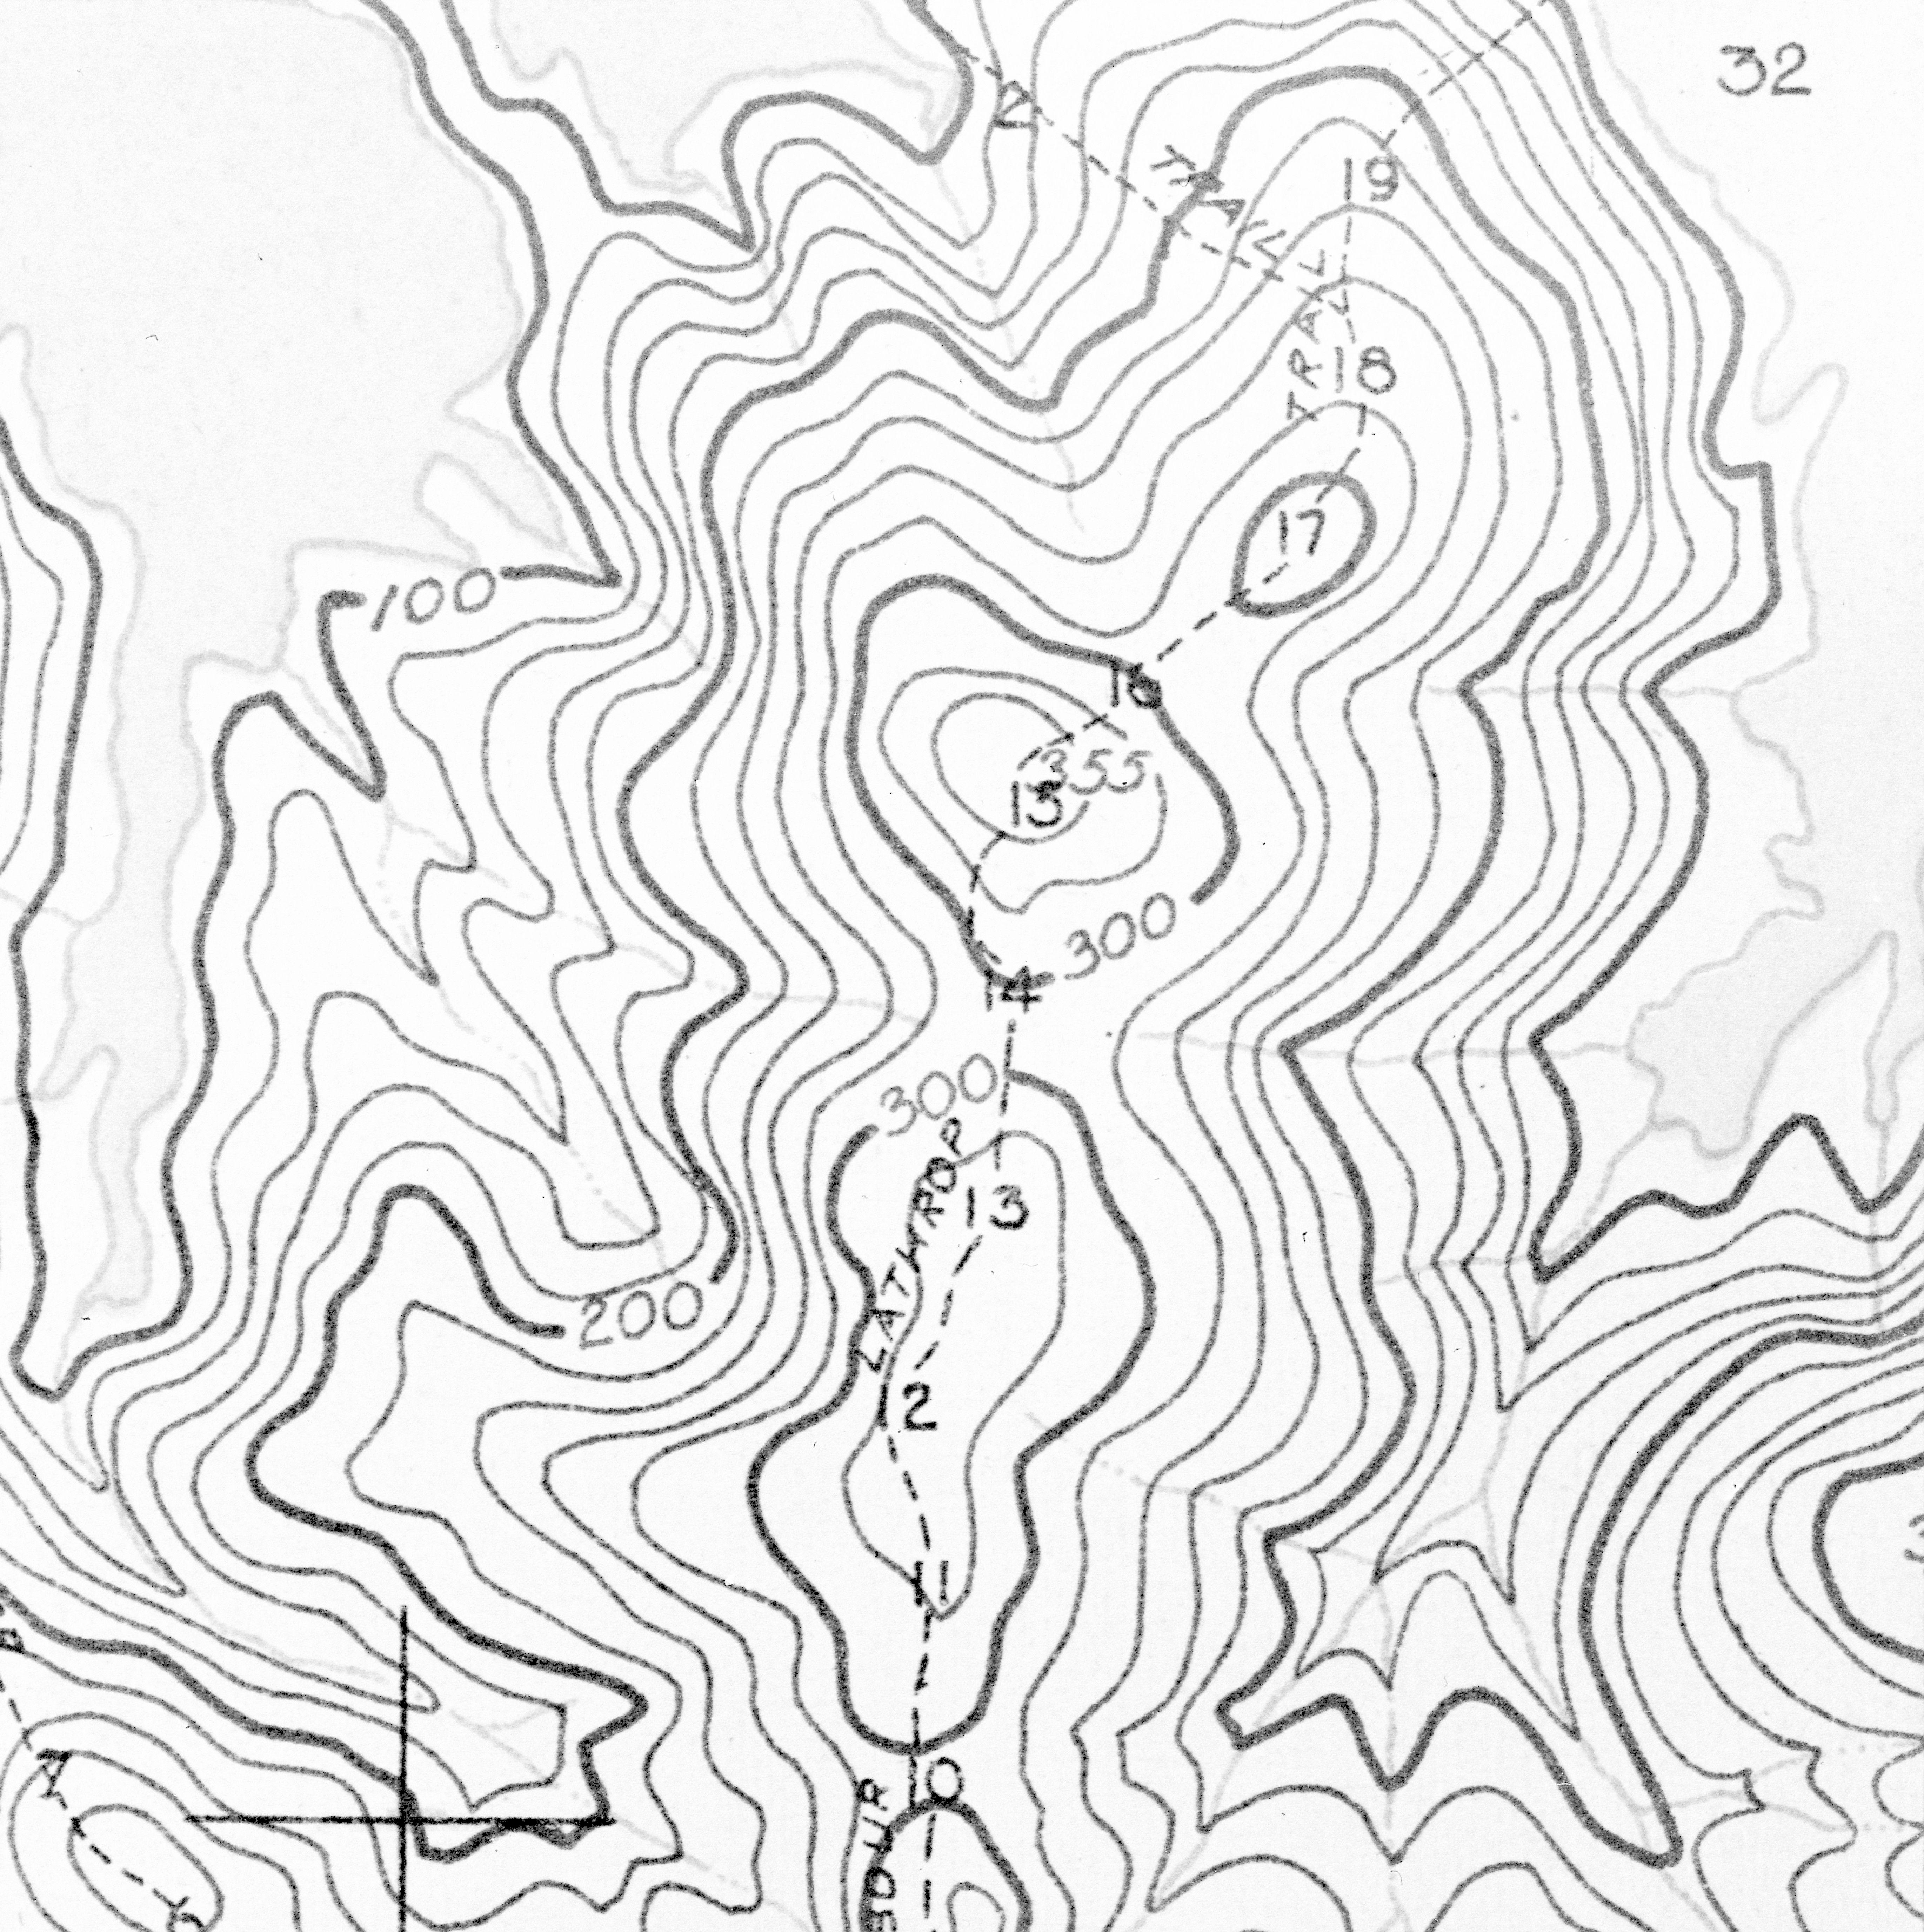 Barro Colorado Island Topographic Map Panama